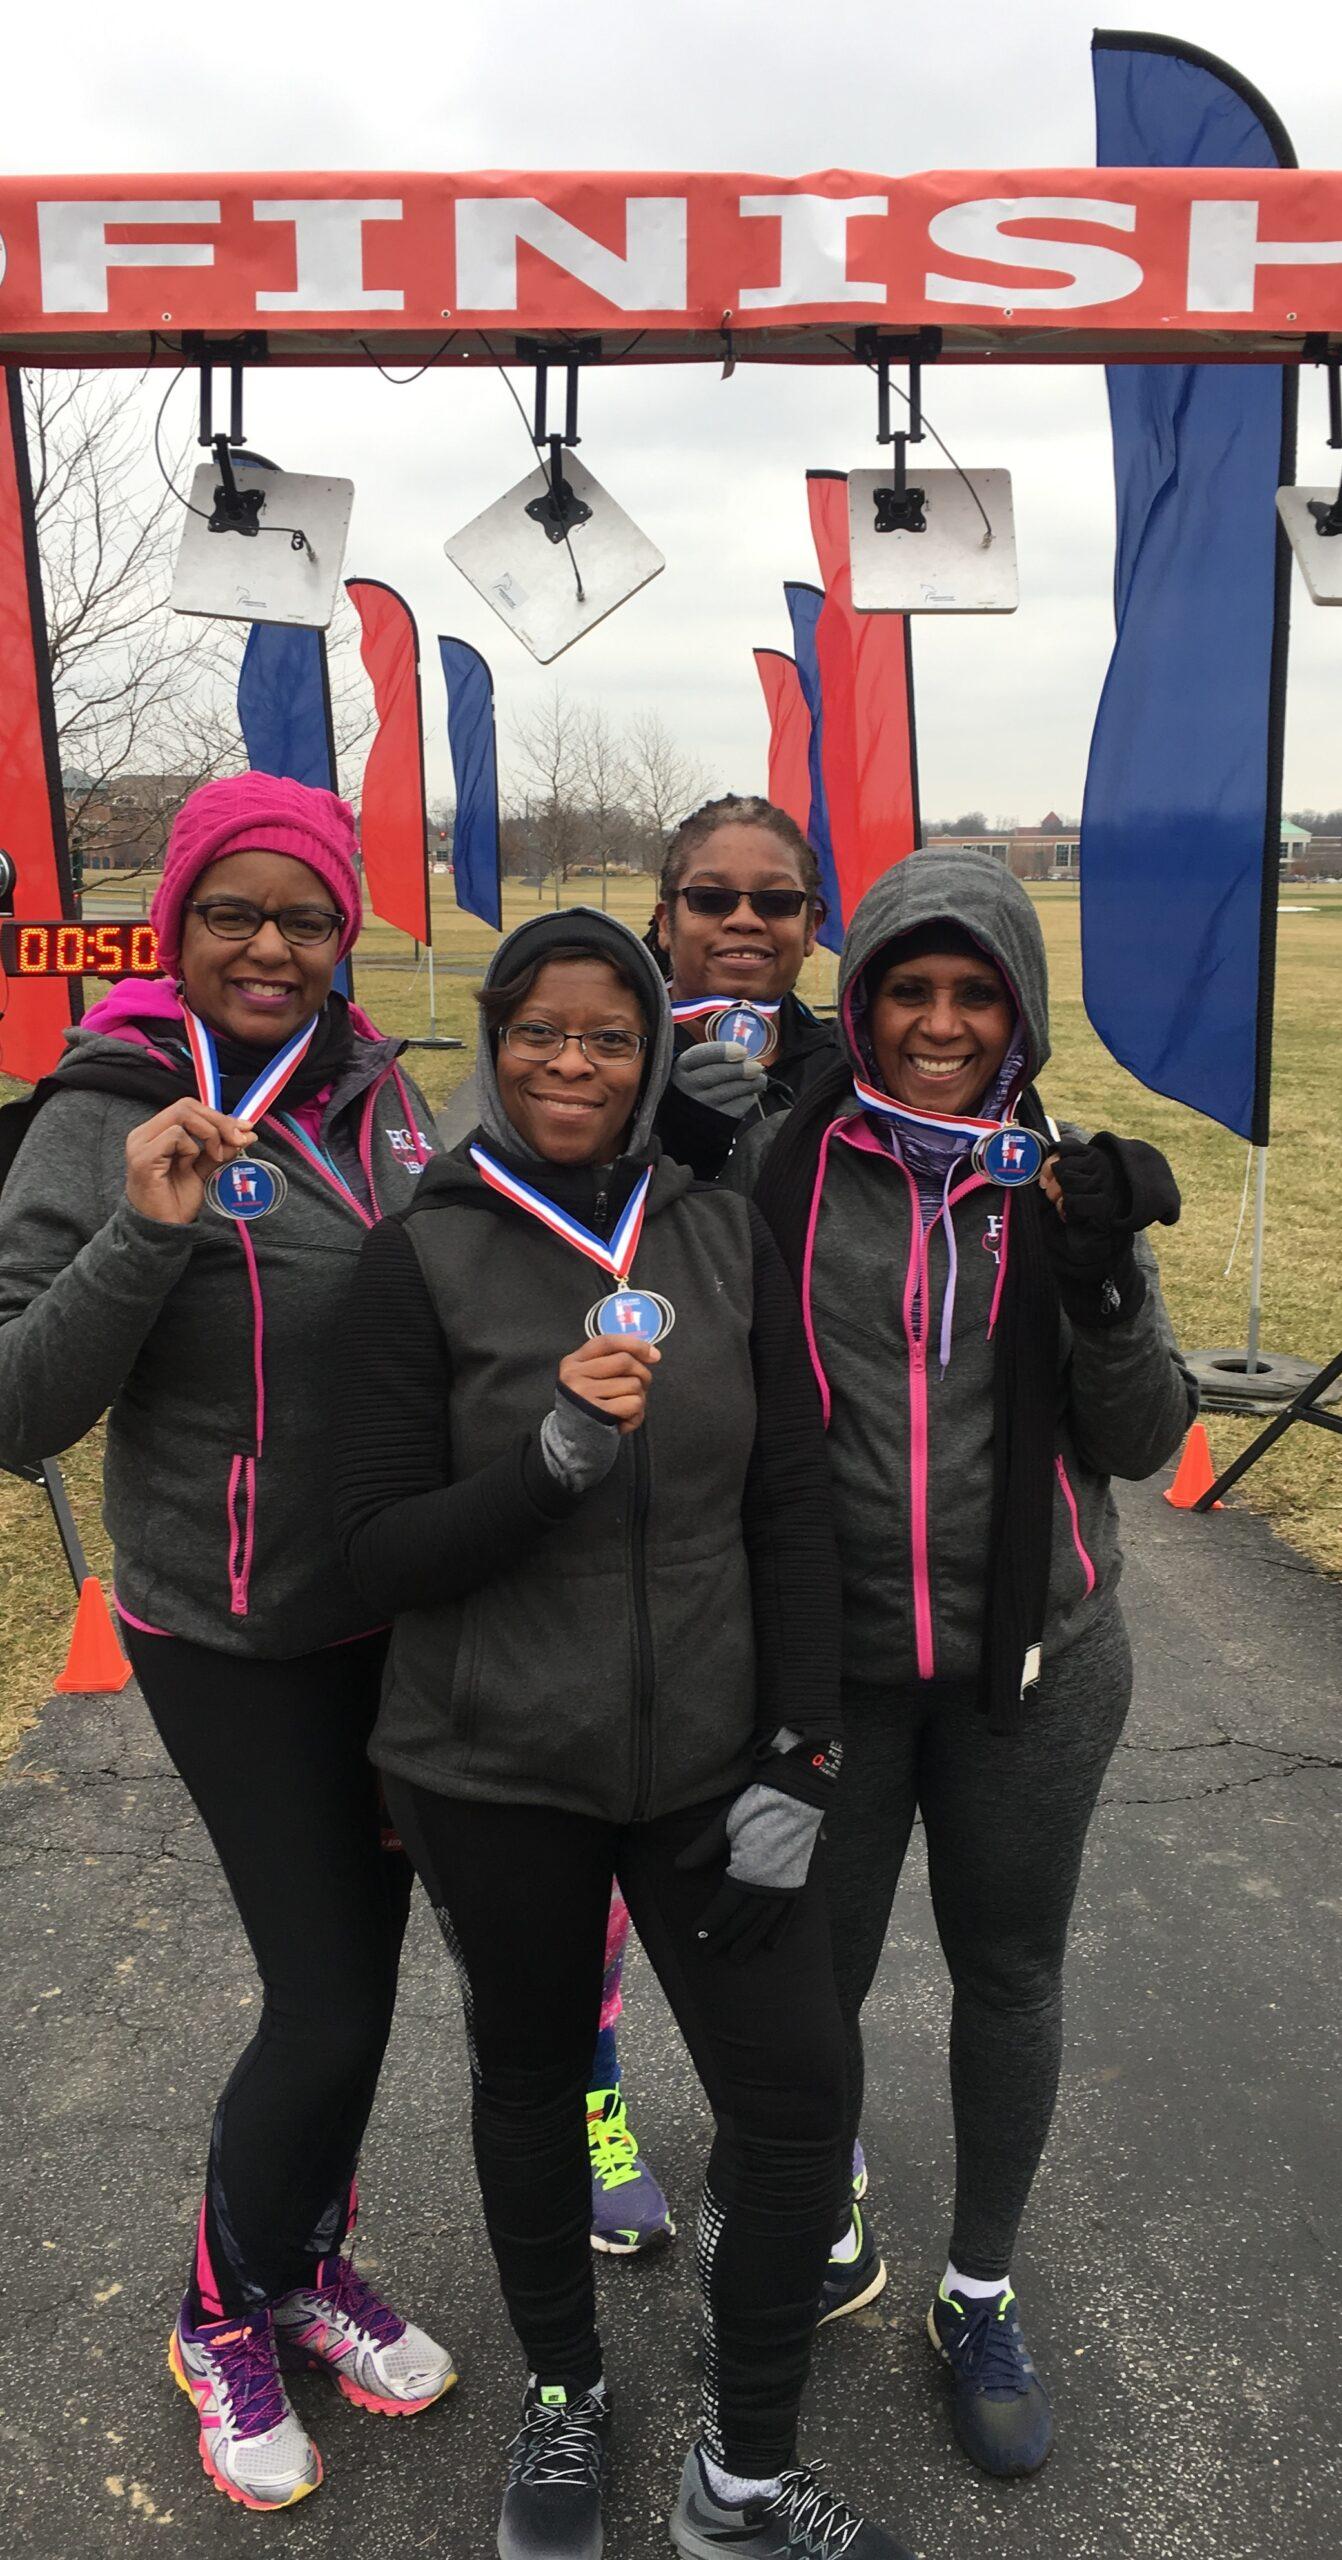 Race Registrant Finish Line - Columbus, Ohio - USA and Ohio Race Timing & Event Management 5k 10k Half Marathon Marathon